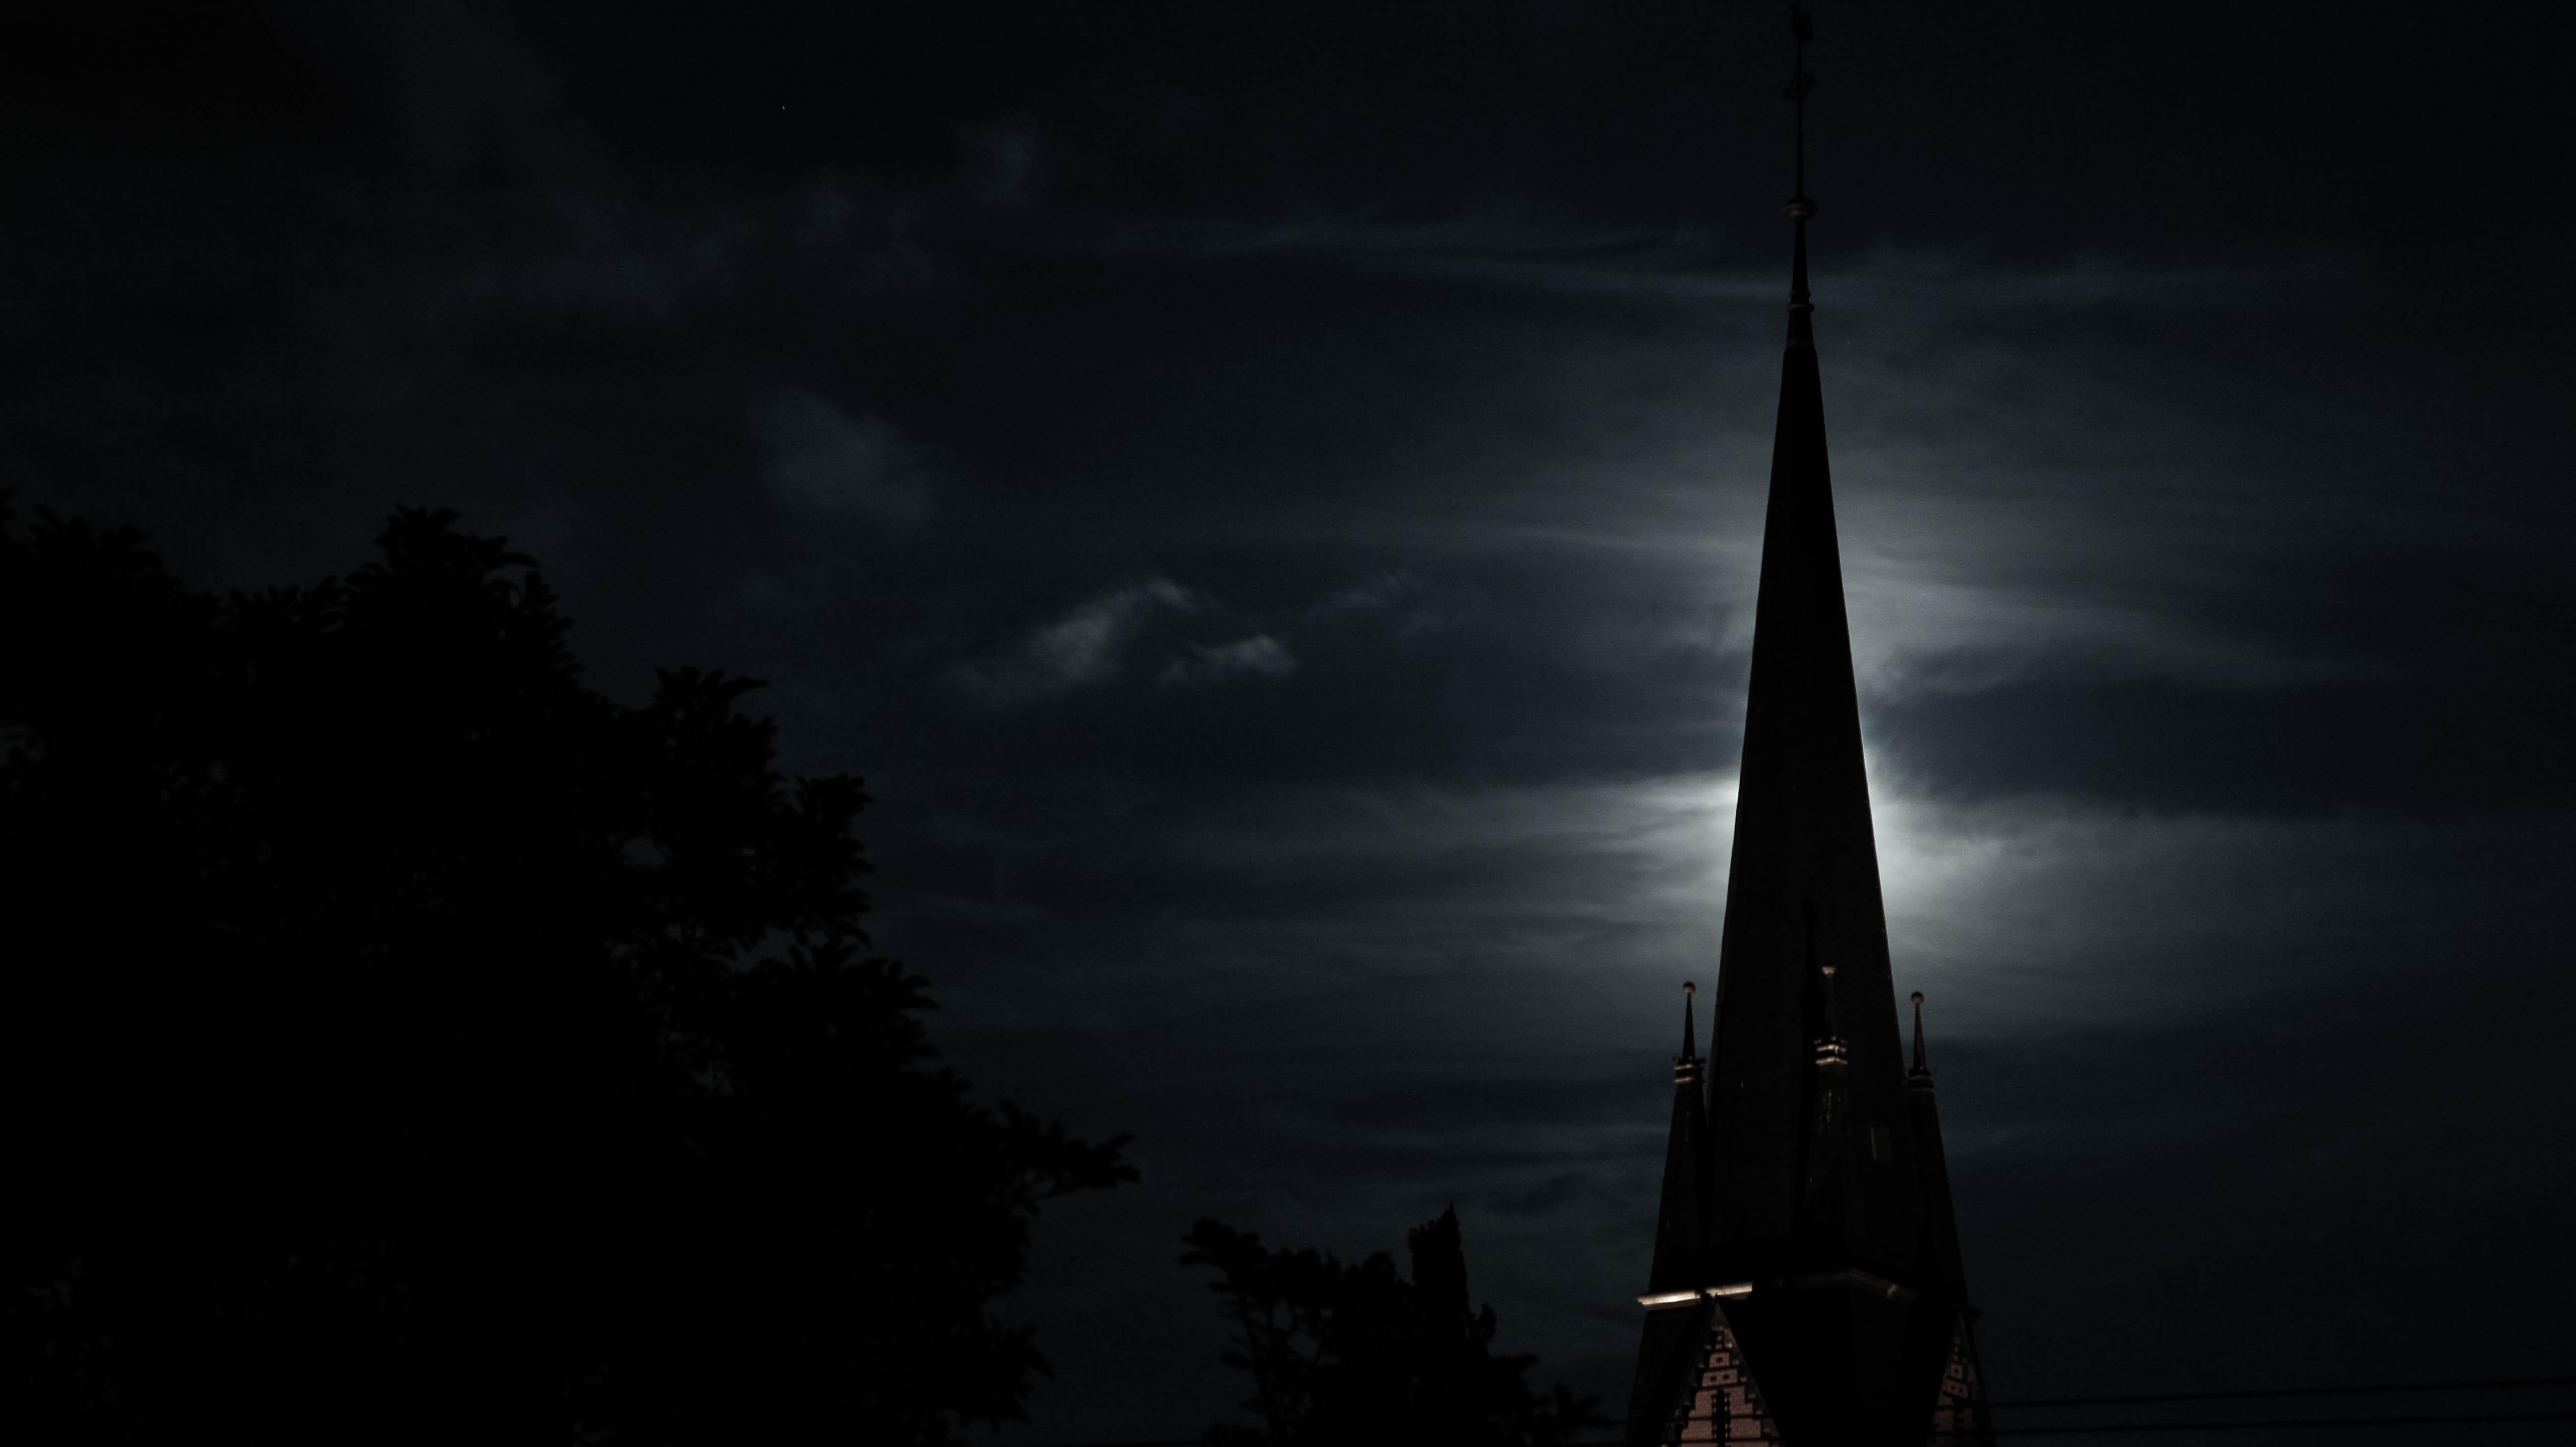 Church at night photo